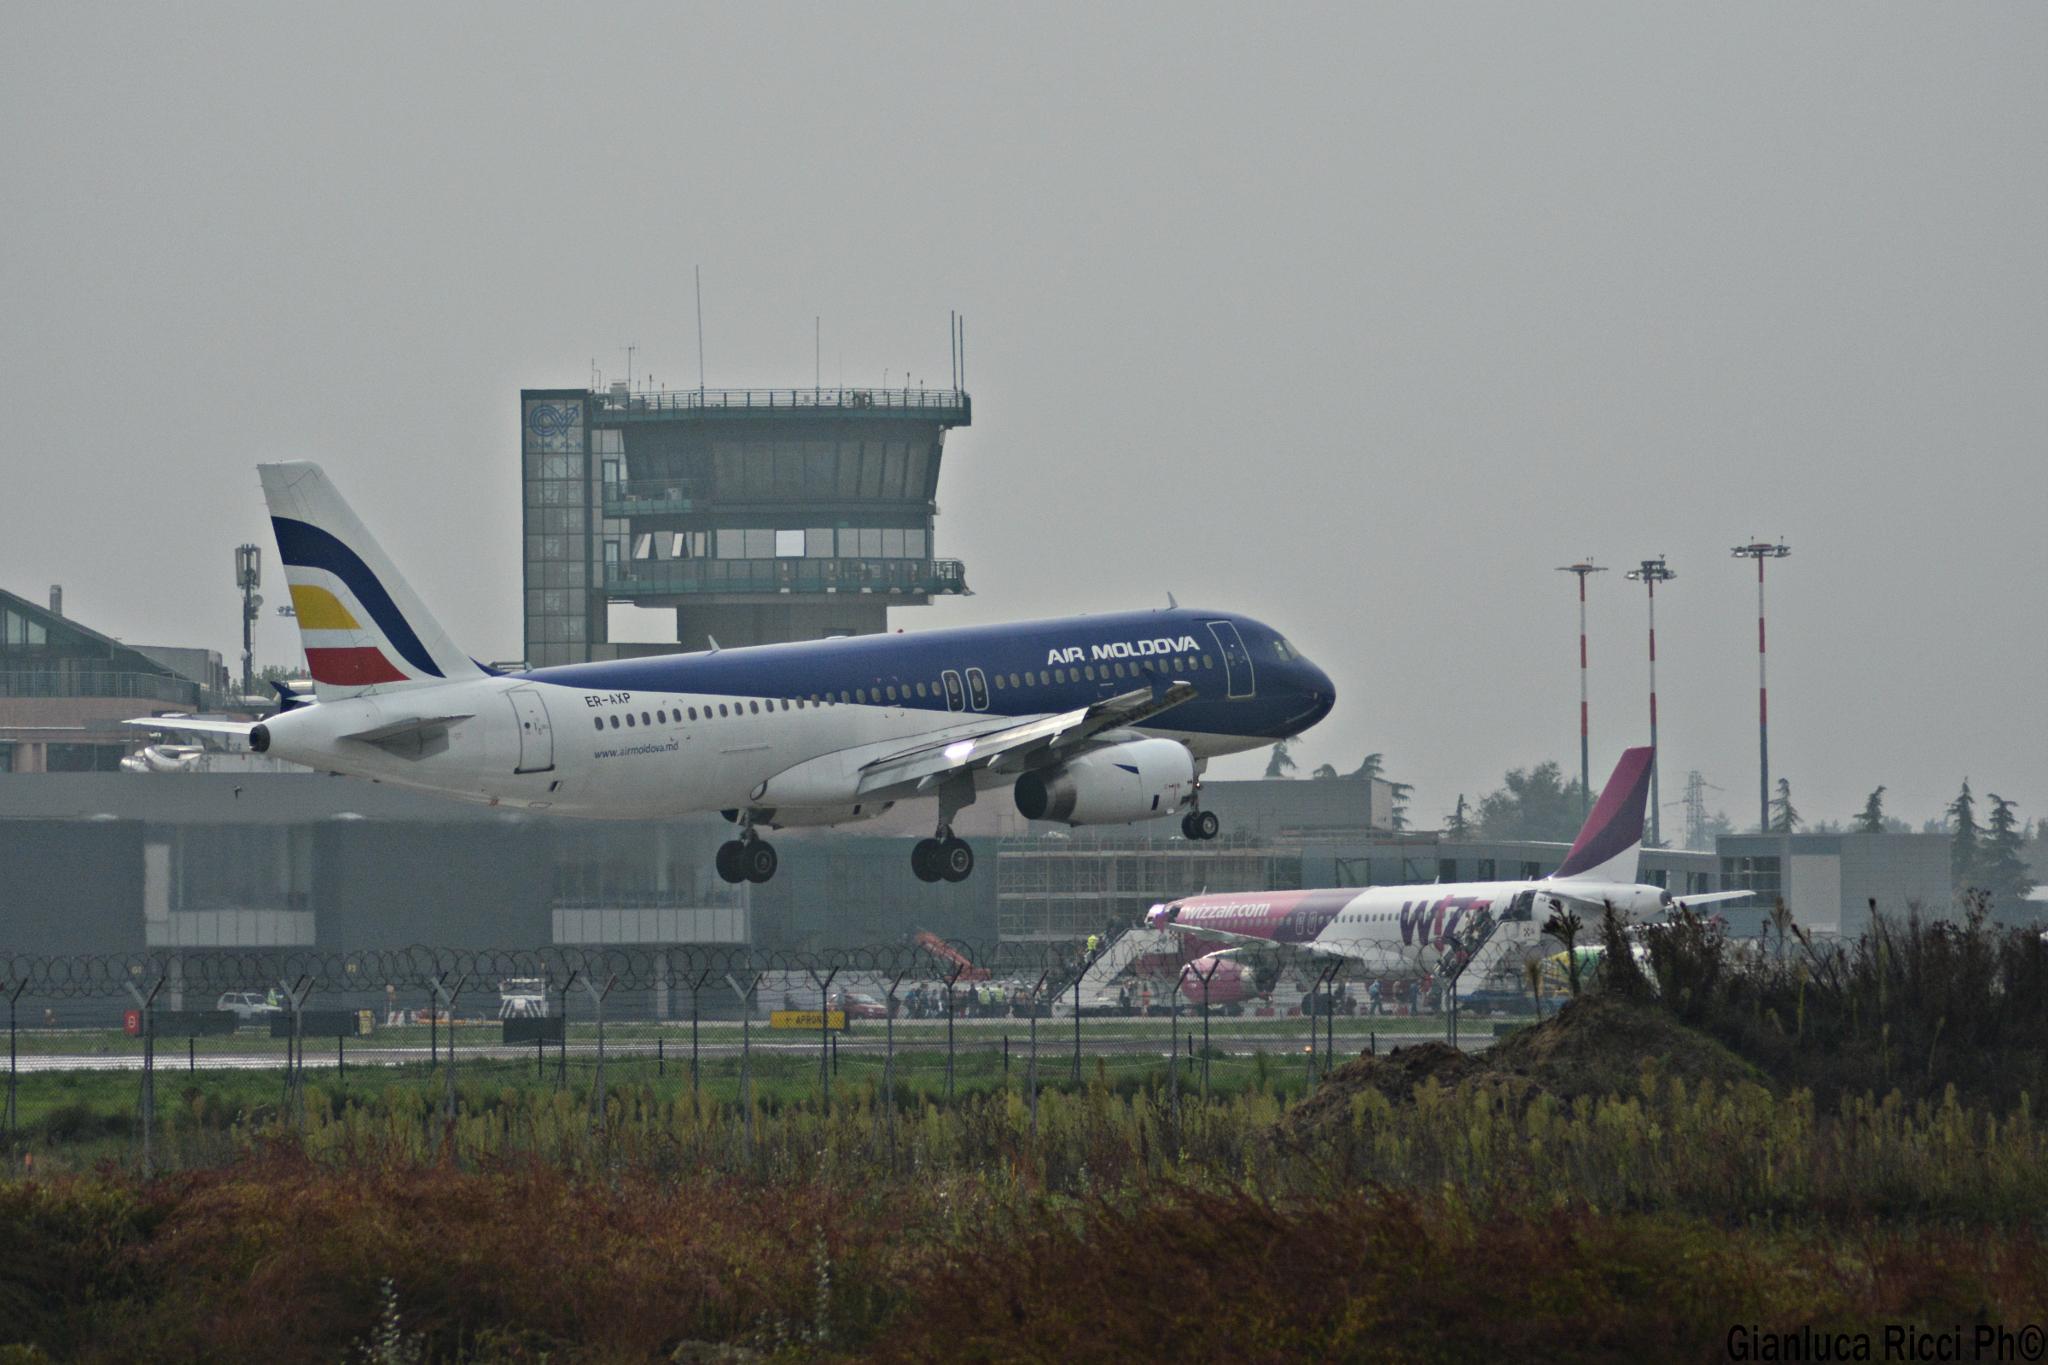 Landing by Ricci Gianluca